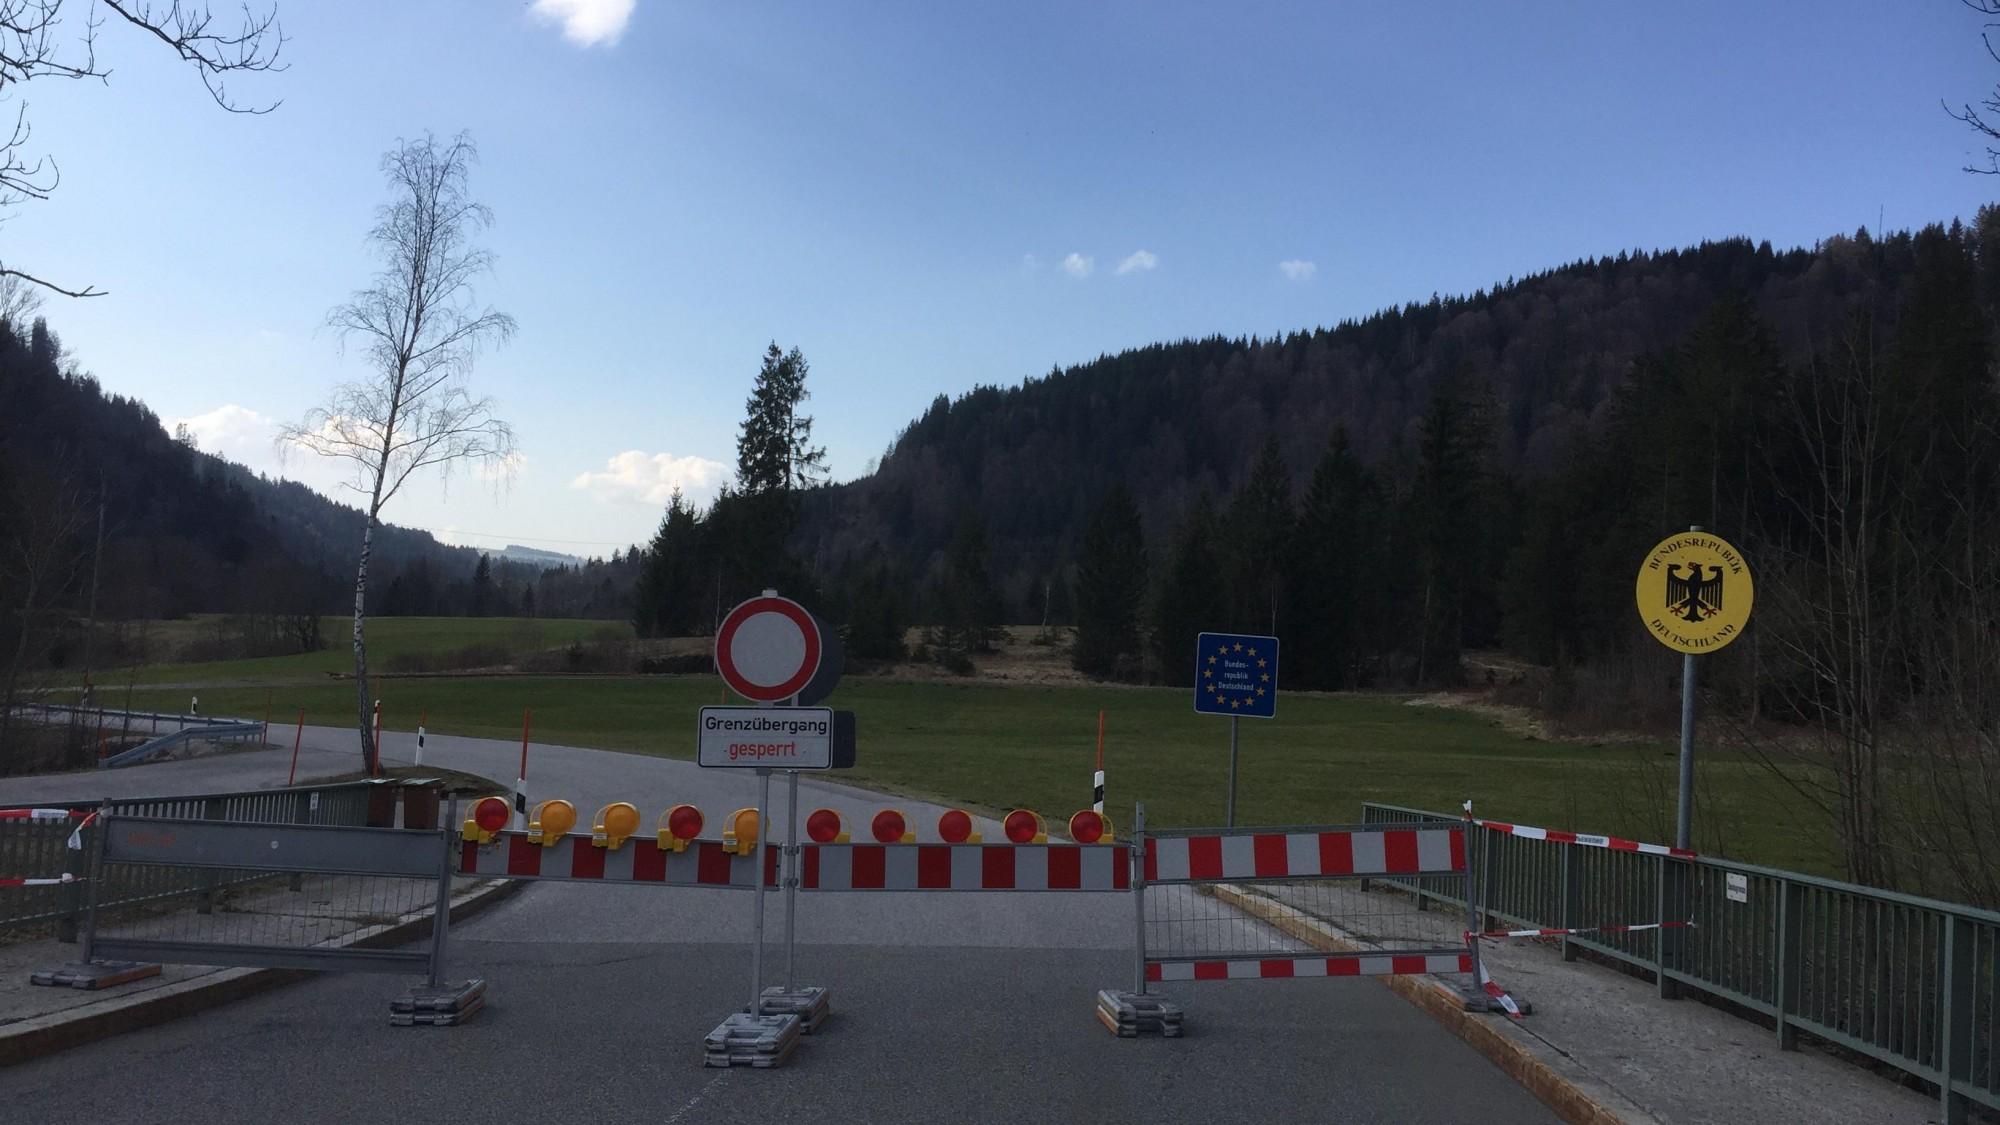 Grenzübergang Habsbichl